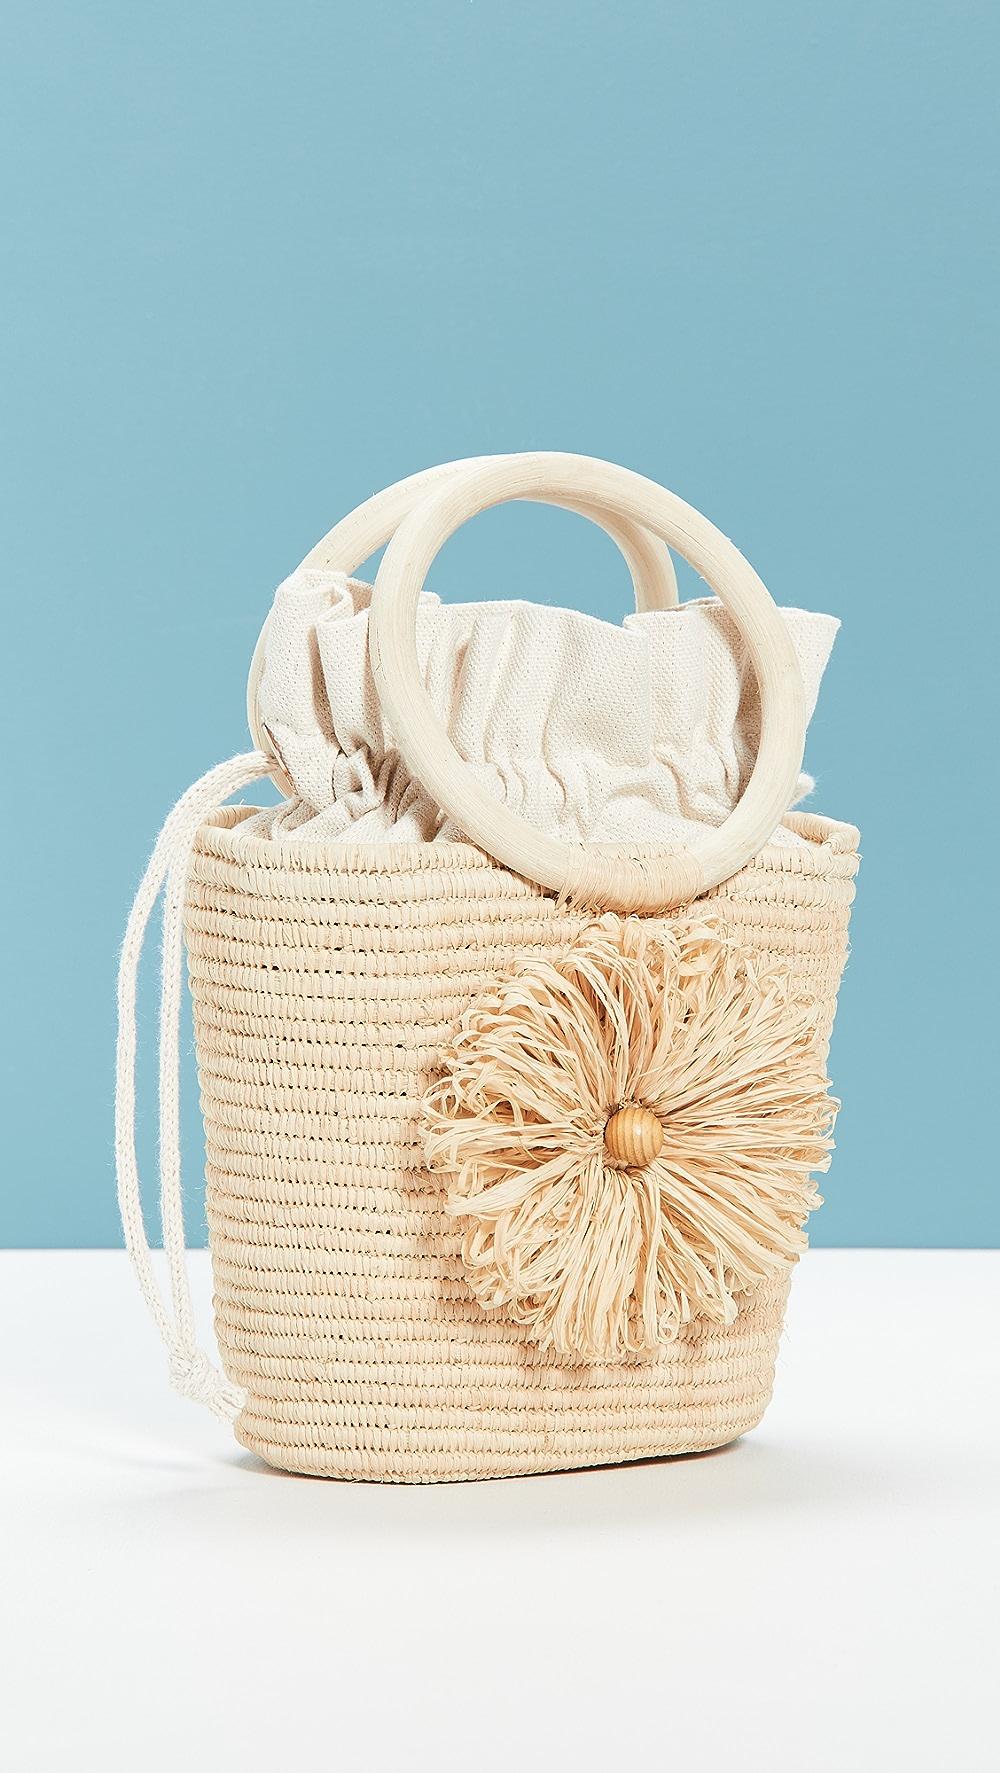 Liberal Poolside Bags - Nyc To Capri Mini Beach Tote Comfortable Feel